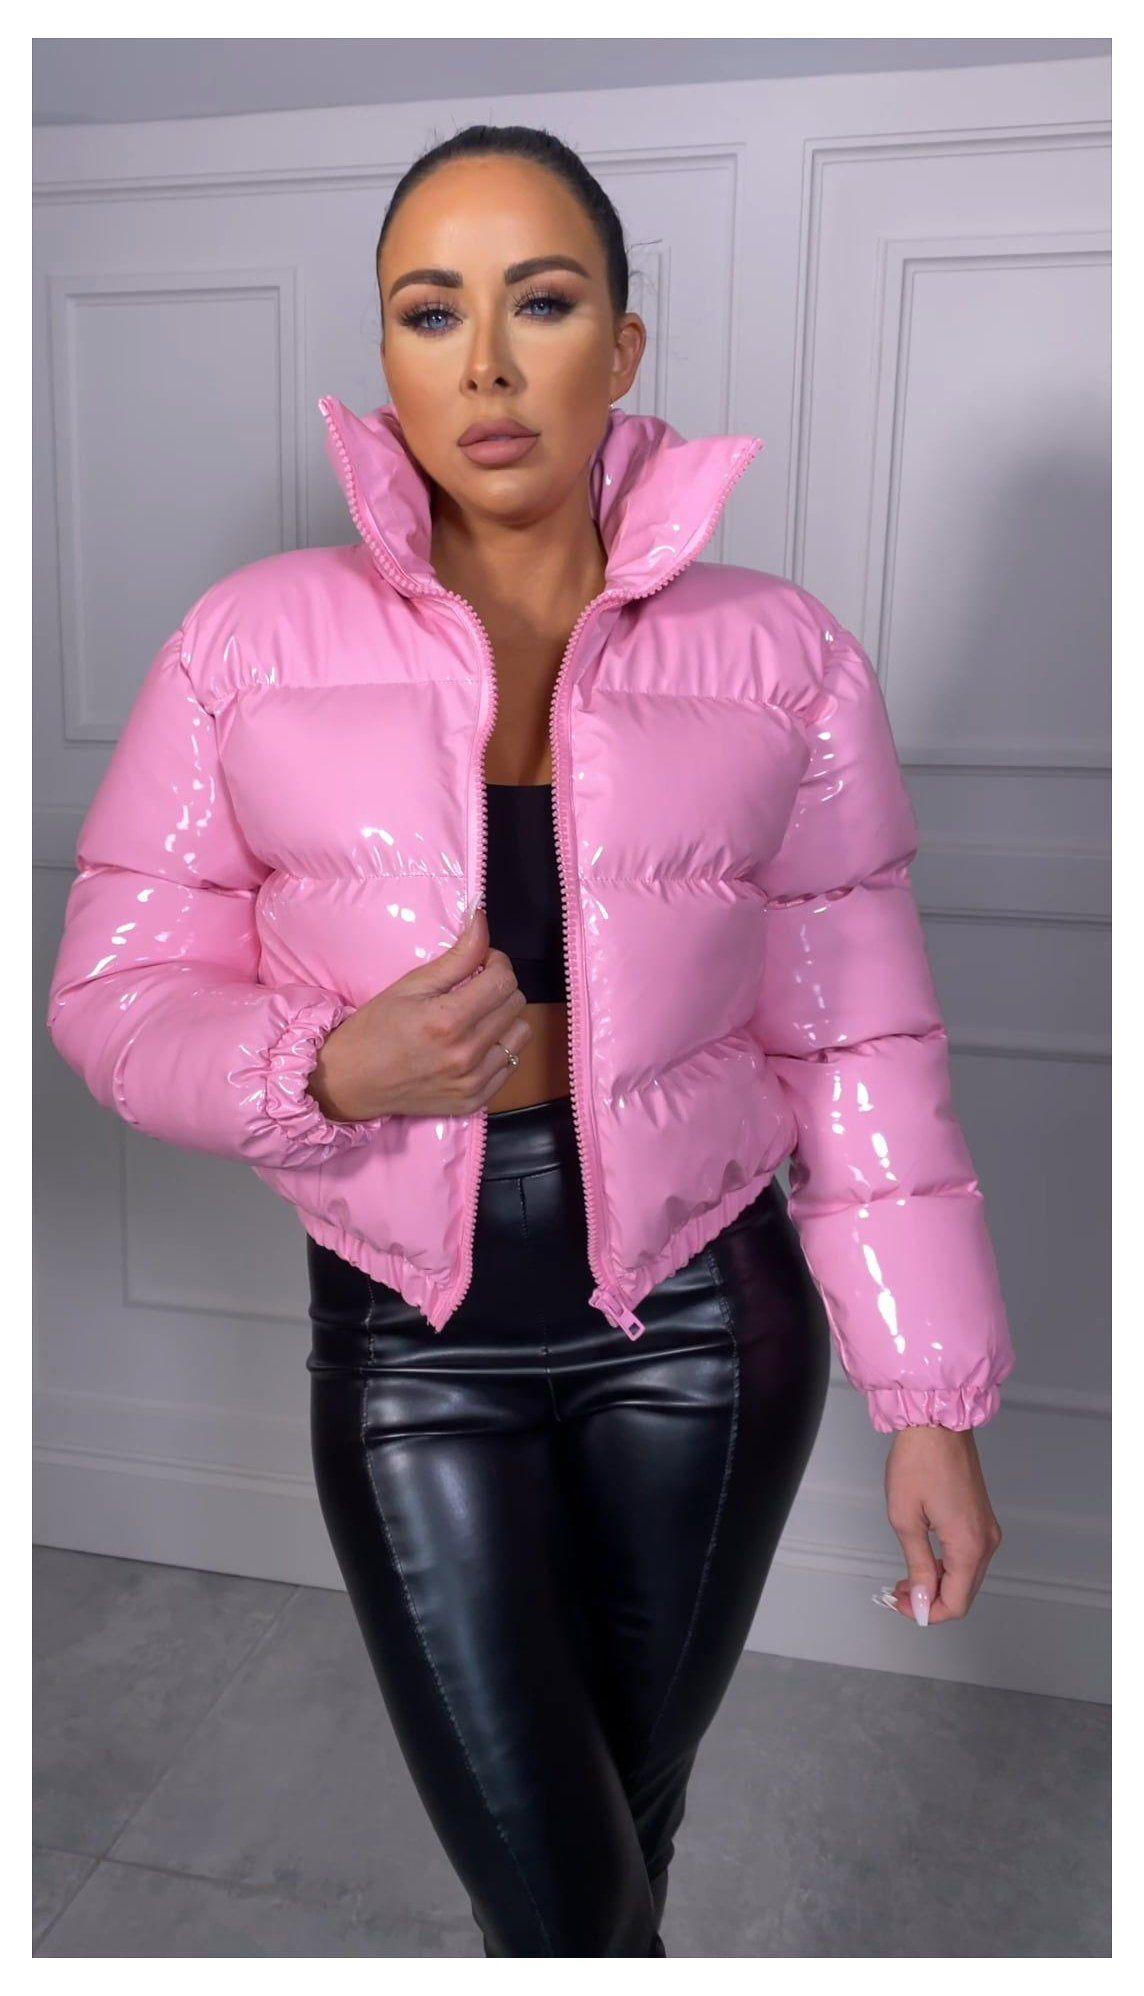 Pink Puffer Jacket Pink Puffer Jacket Pinkpufferjacket In 2021 Pink Puffer Jacket Puffer Jacket Outfit Jacket Outfit Women [ 1996 x 1144 Pixel ]